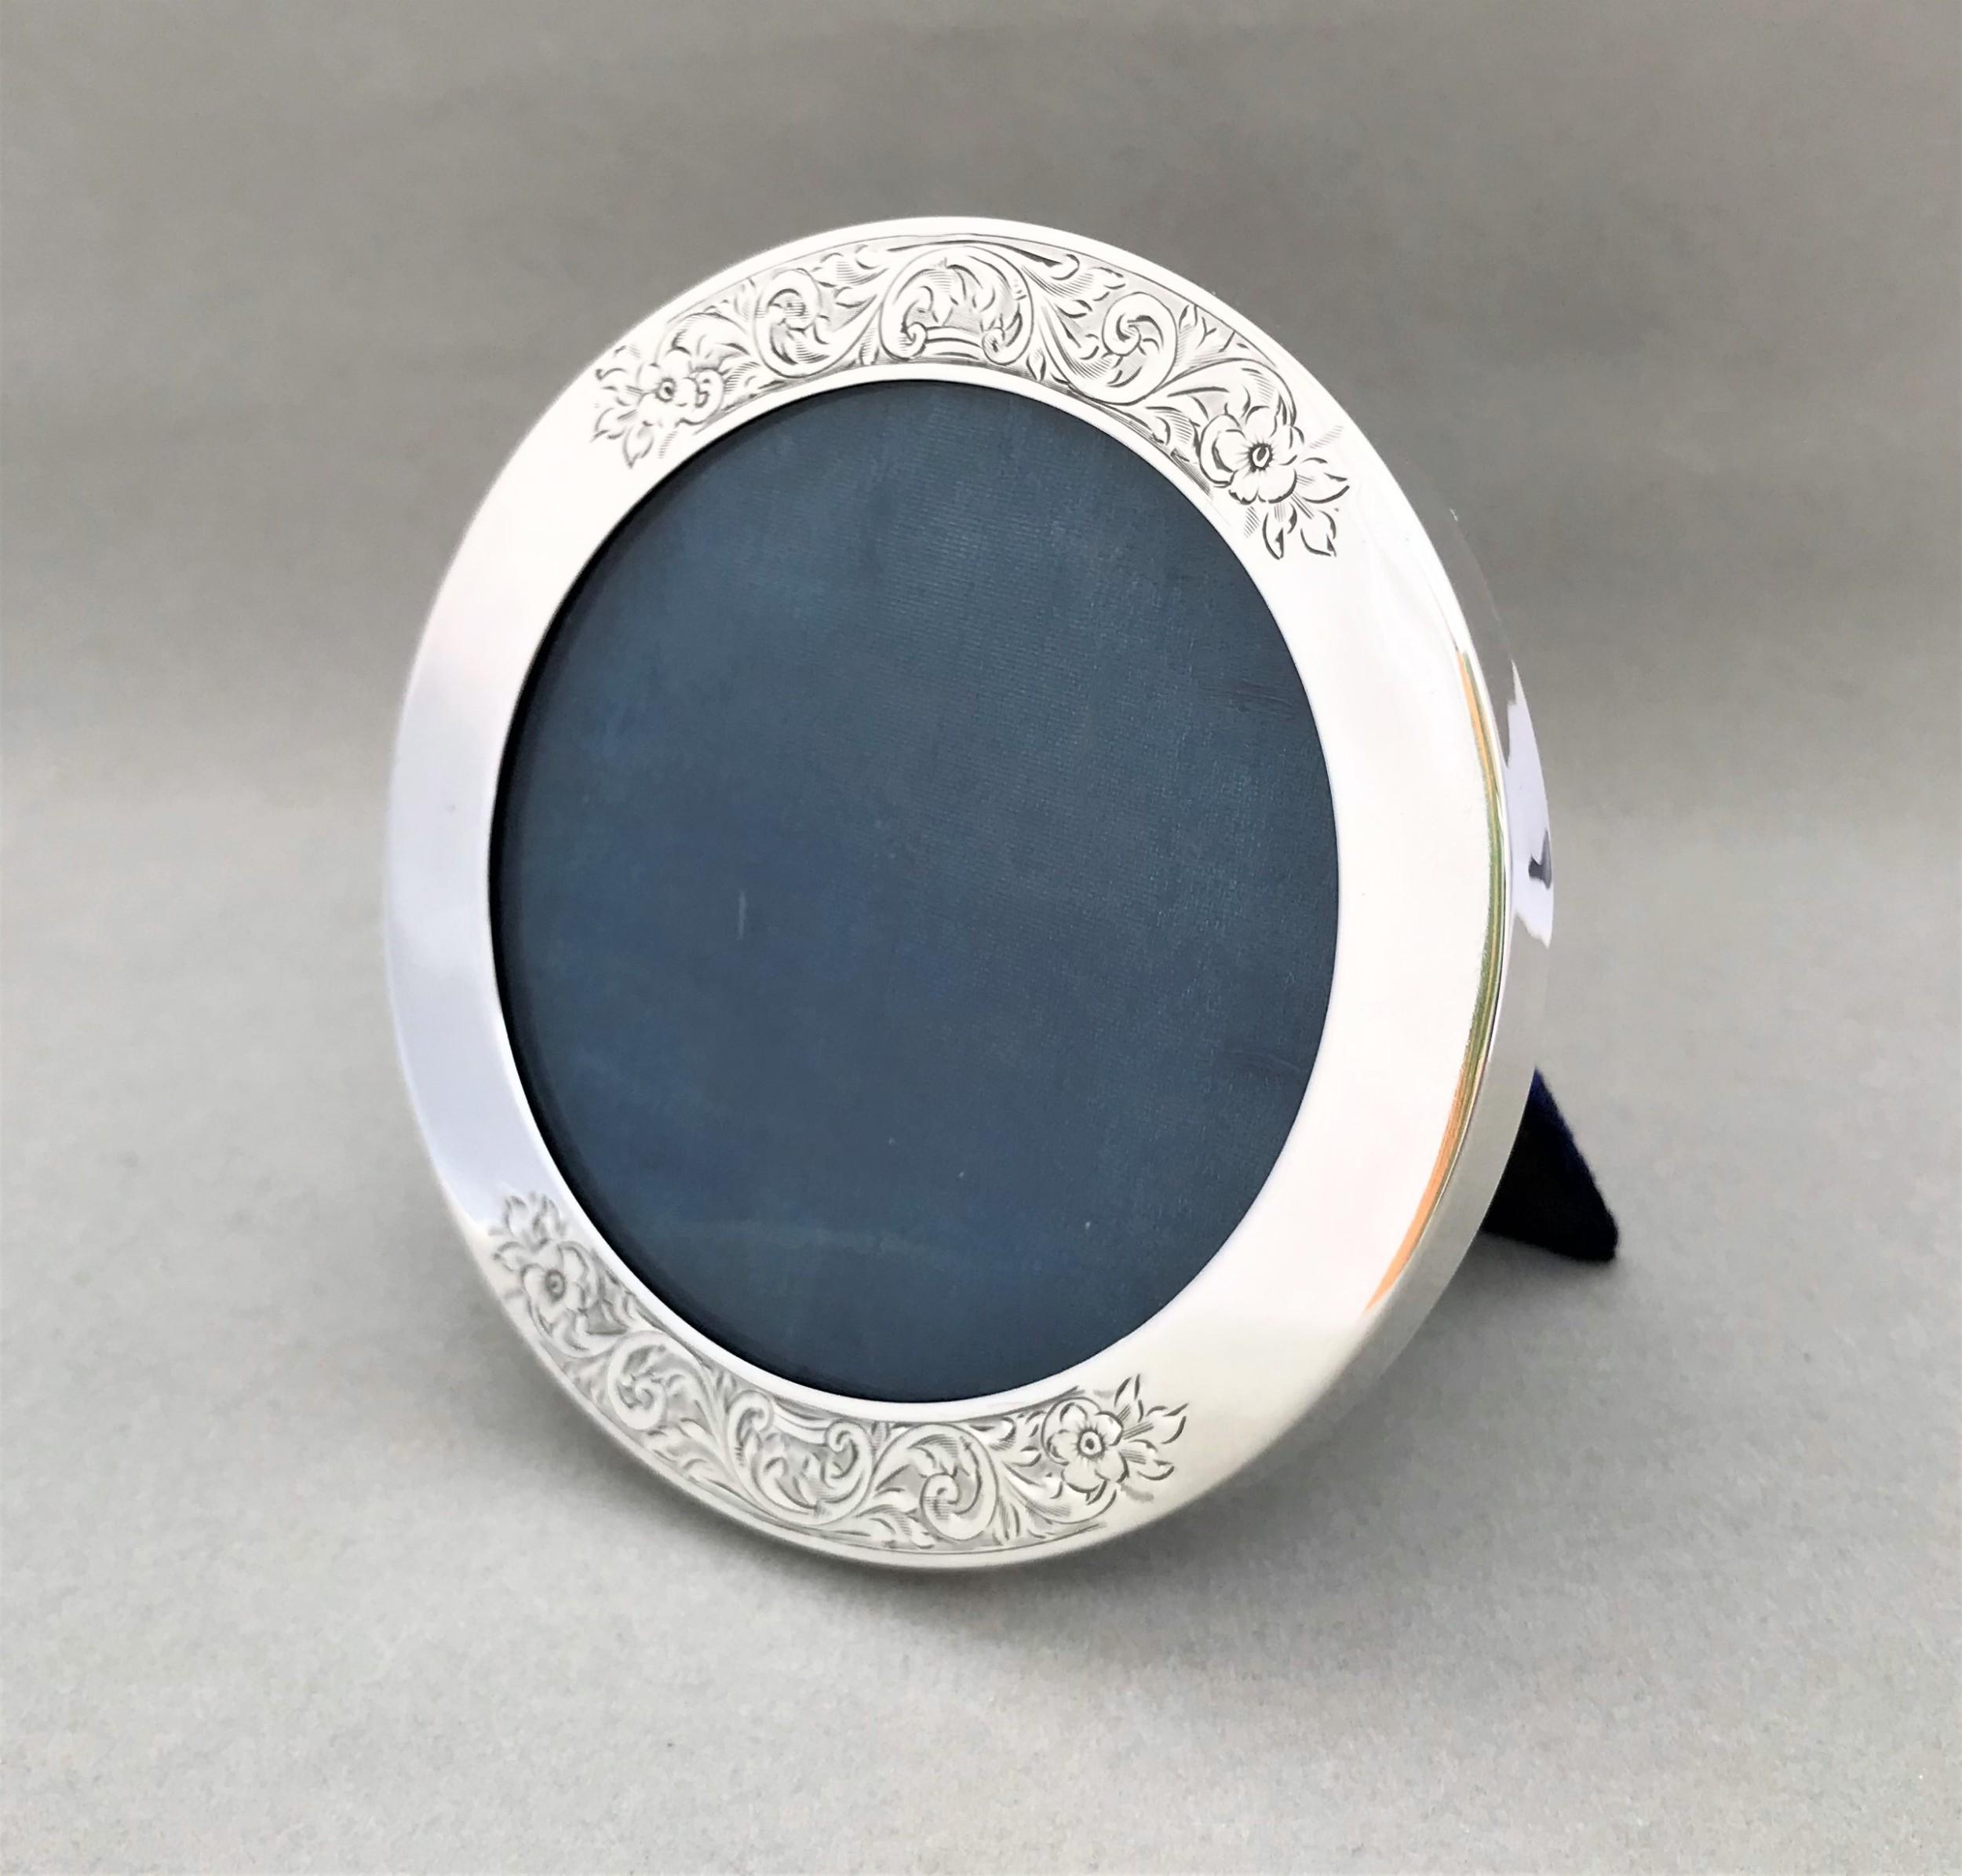 a stylish circular silver photo frame